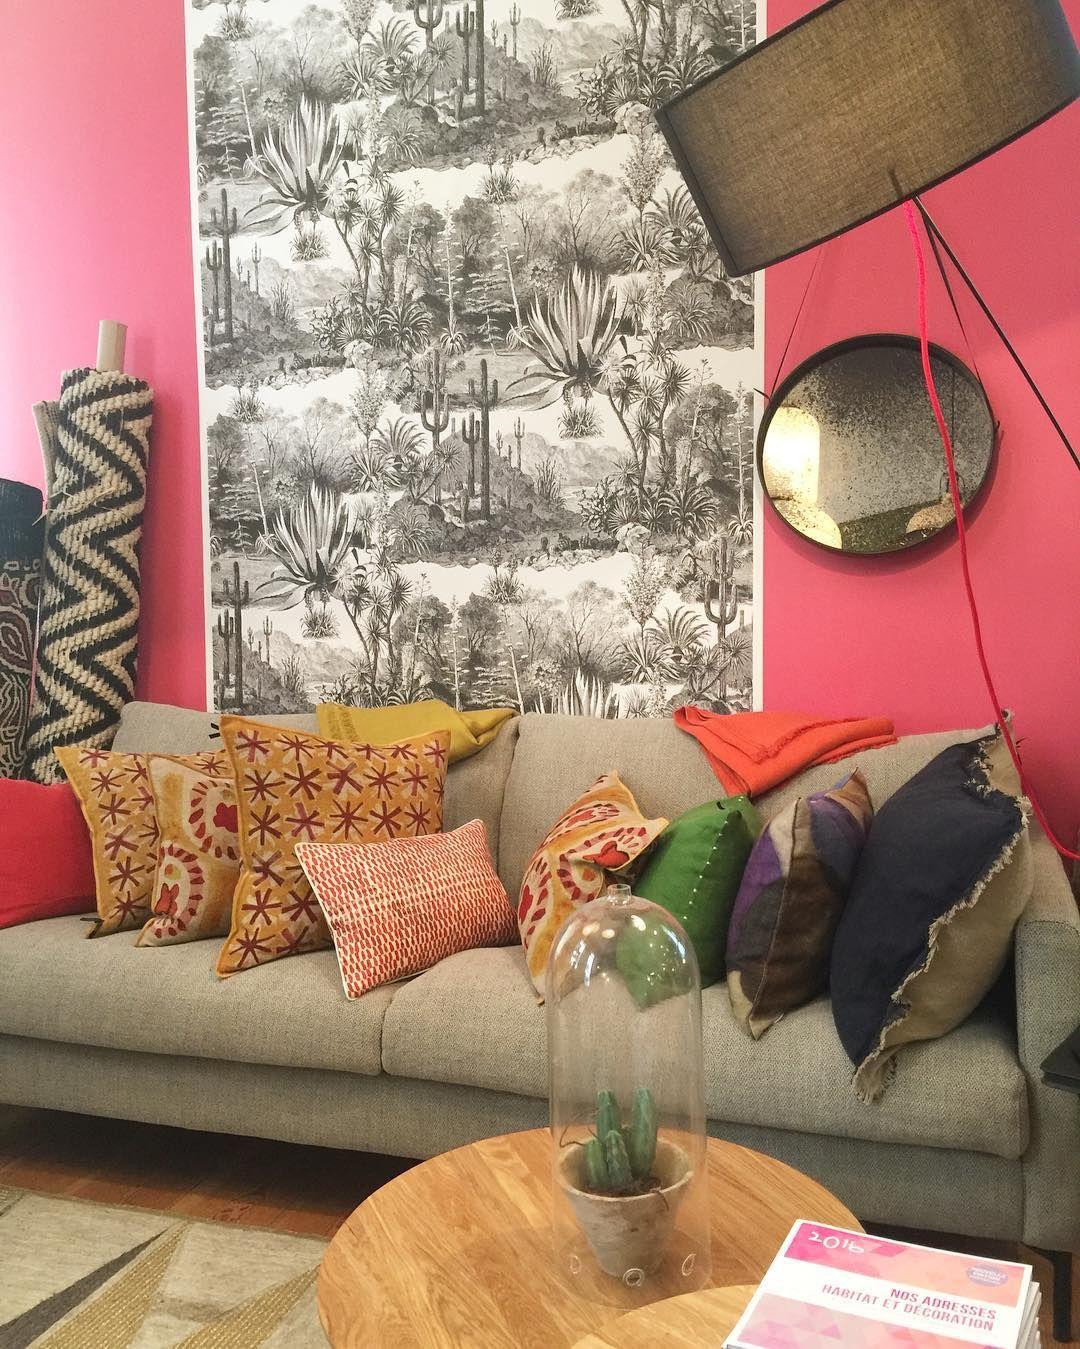 Des Belles Inspirations Deco Reperees Dans La Boutique Vues D Interieur Montpellier Decor Inspiration Magdeco In 2020 Home Interior Design Home Decor Interior